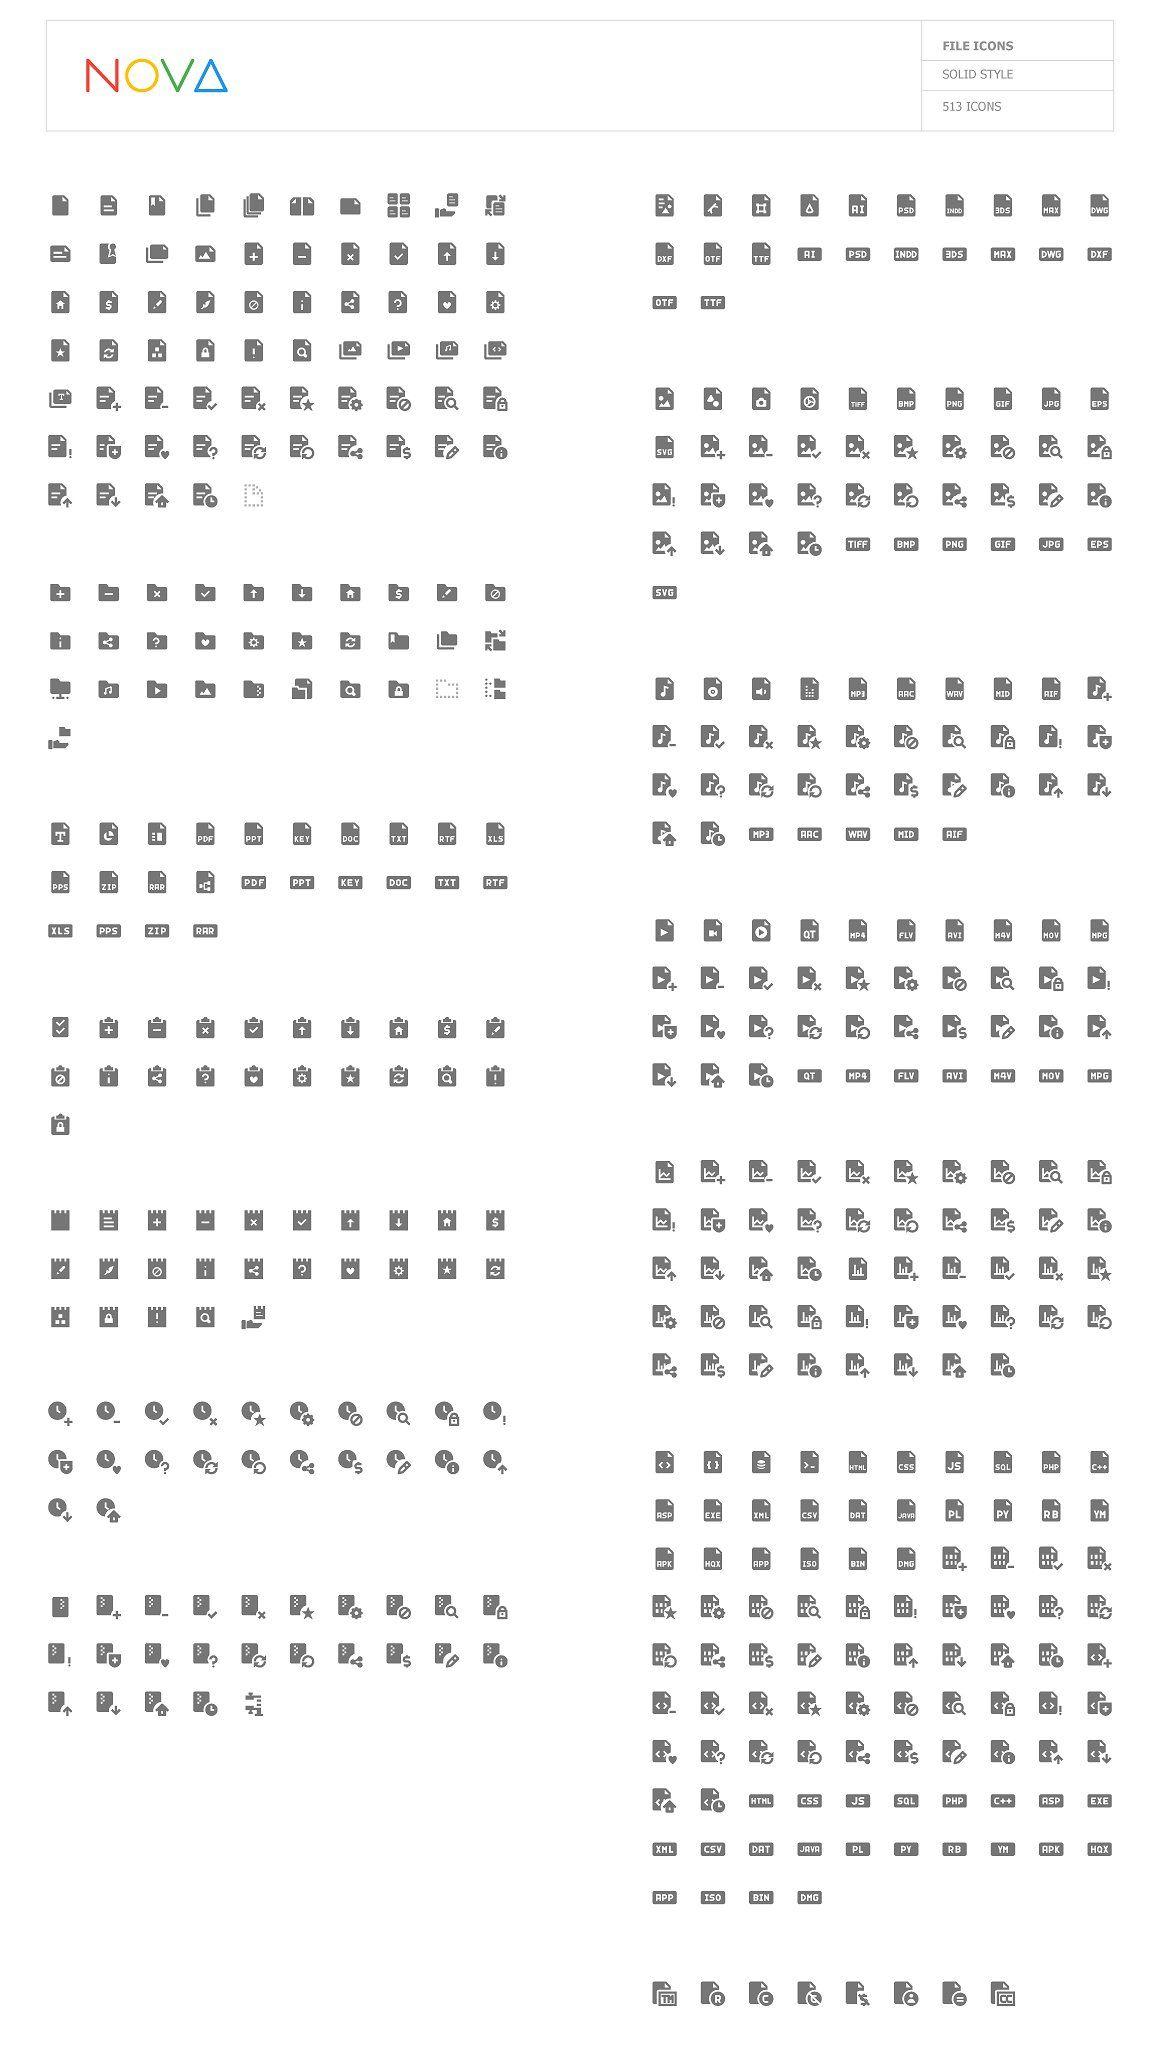 4000 Material Design Icons - NOVA #readability#clarity#small